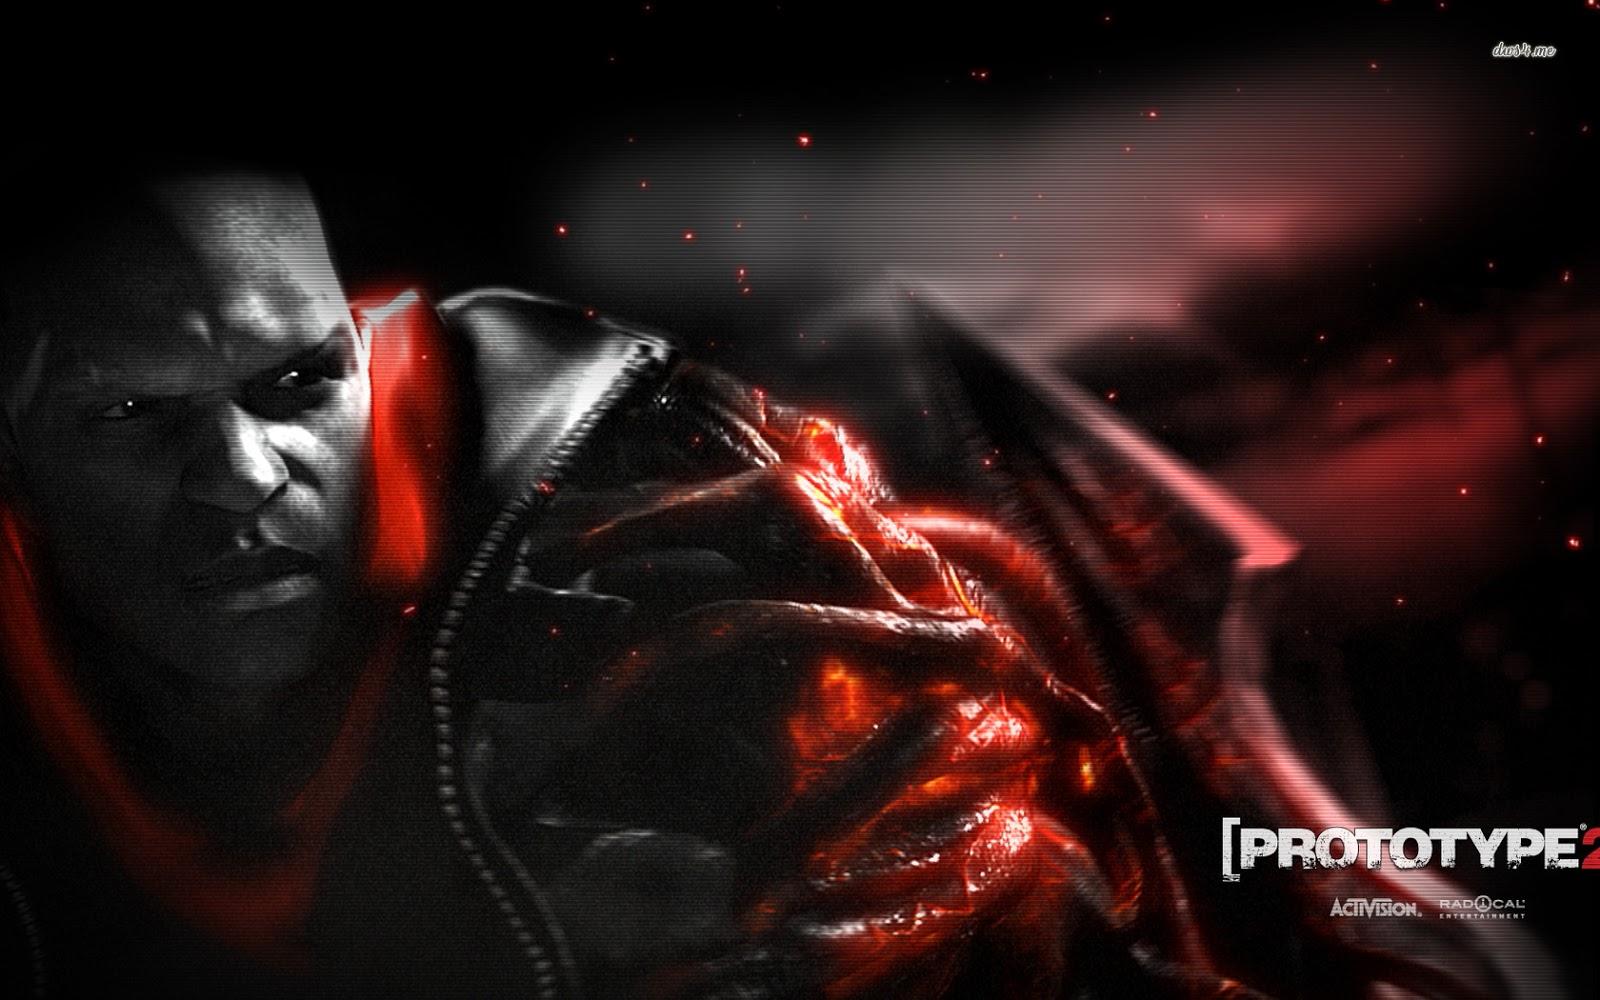 Killzone Shadow Fall Wallpaper 1080p Wallpapers Hd Wallpapers De Prototype Juego Full Hd